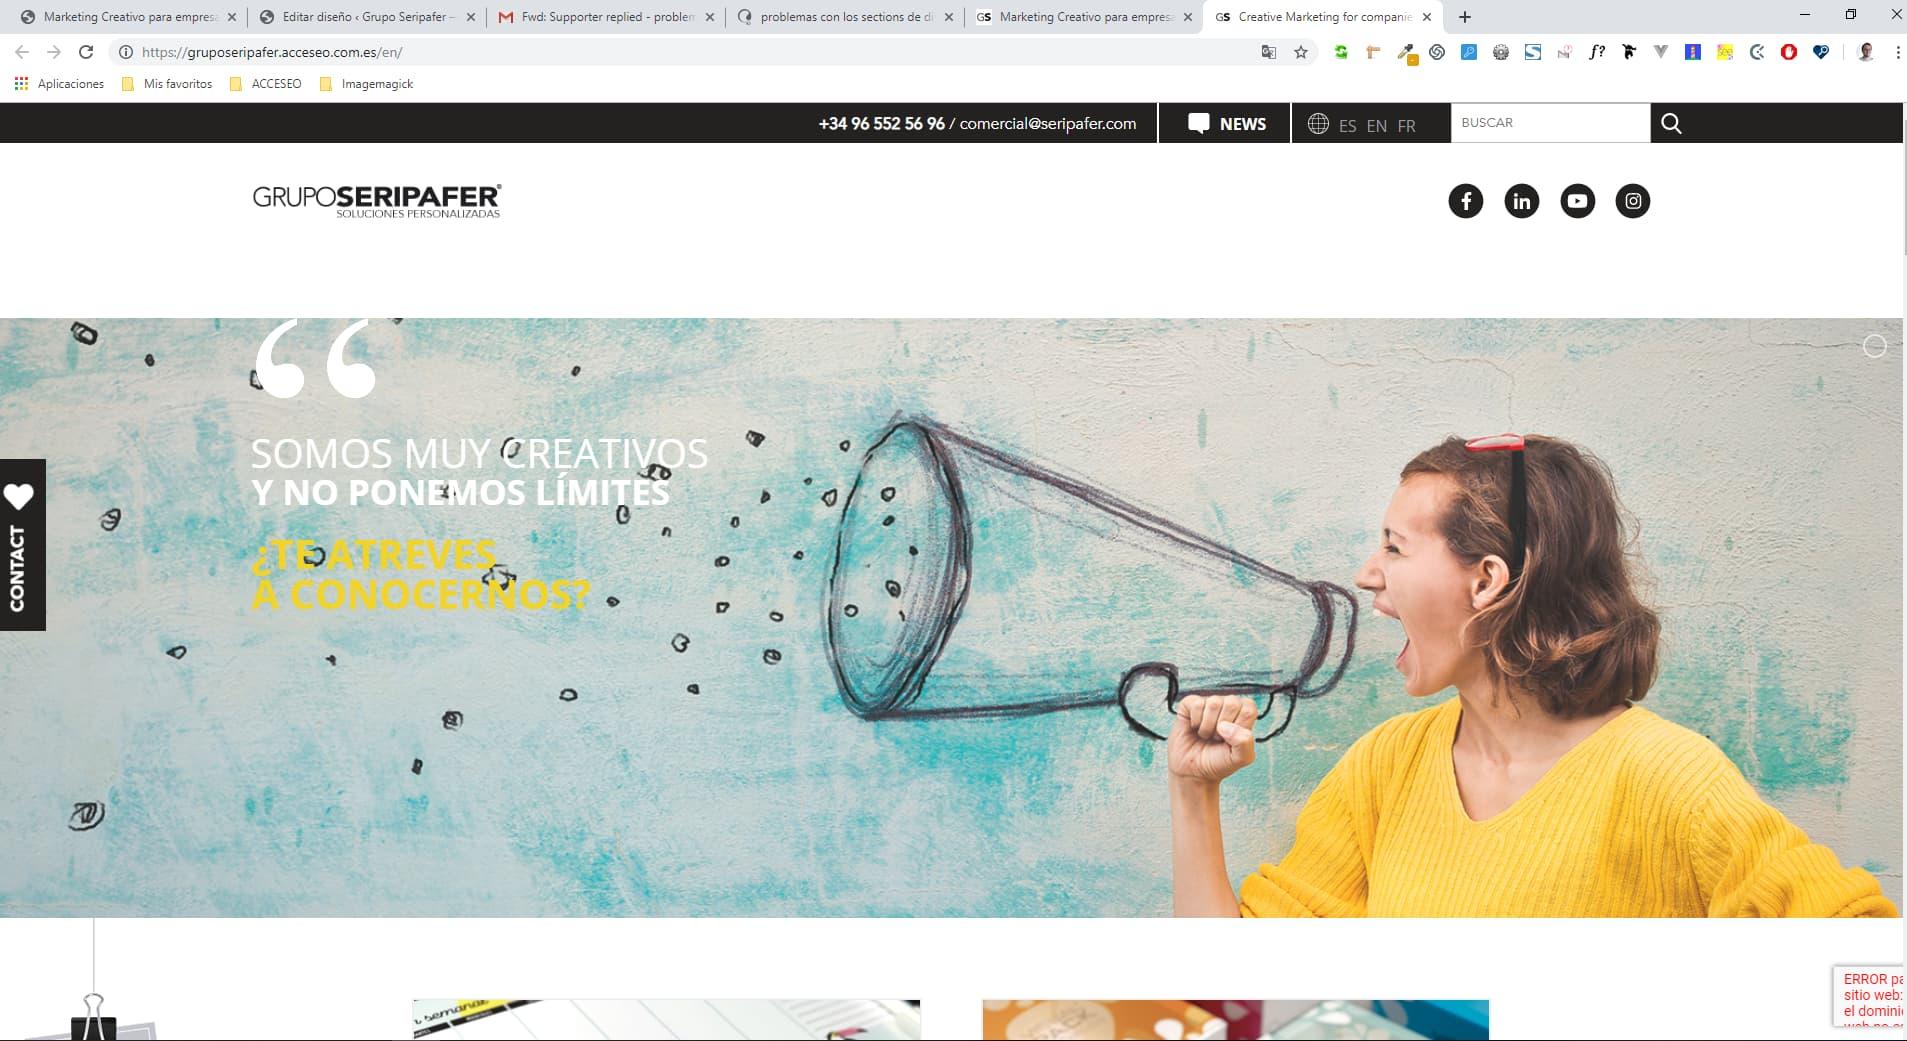 slider_en_ingles_gruposeripafer.com.es.jpg